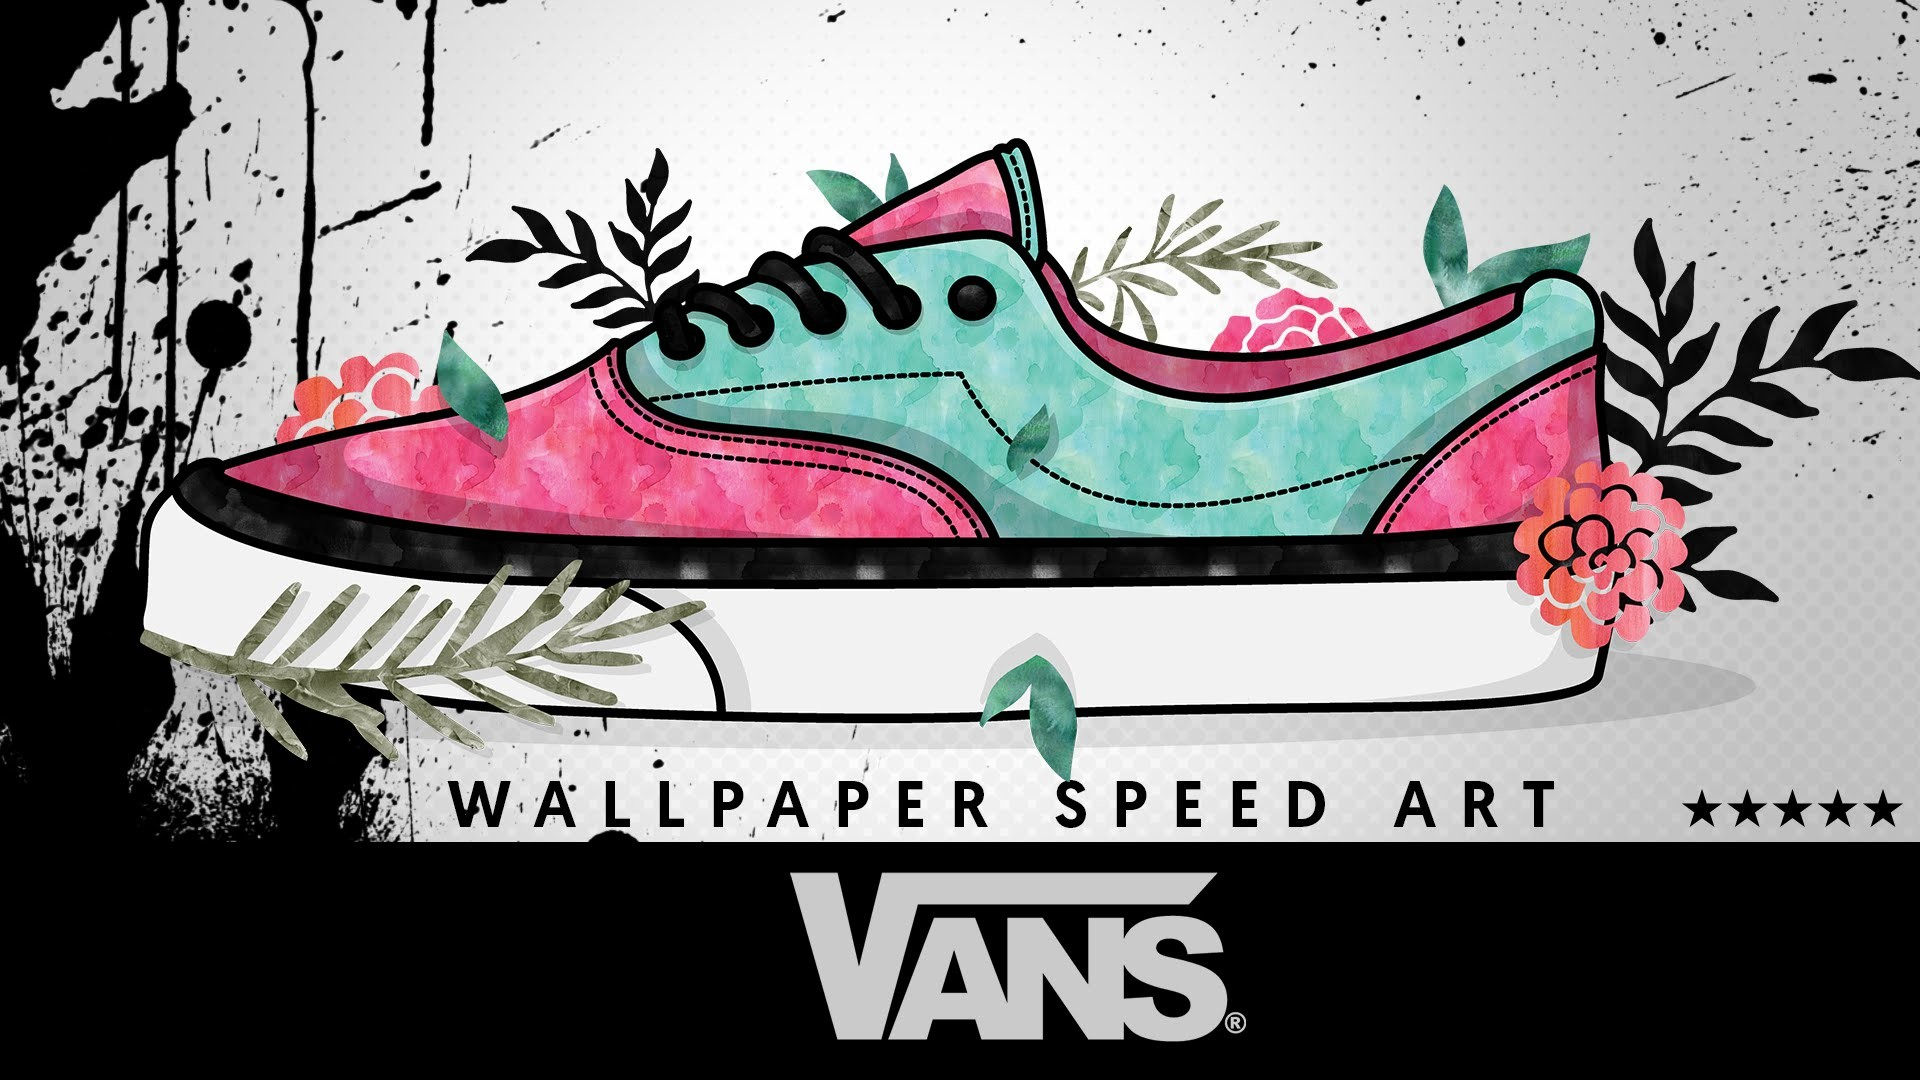 Shoes Vans Wallpaper HD Desktop Wallpaper, Background Image